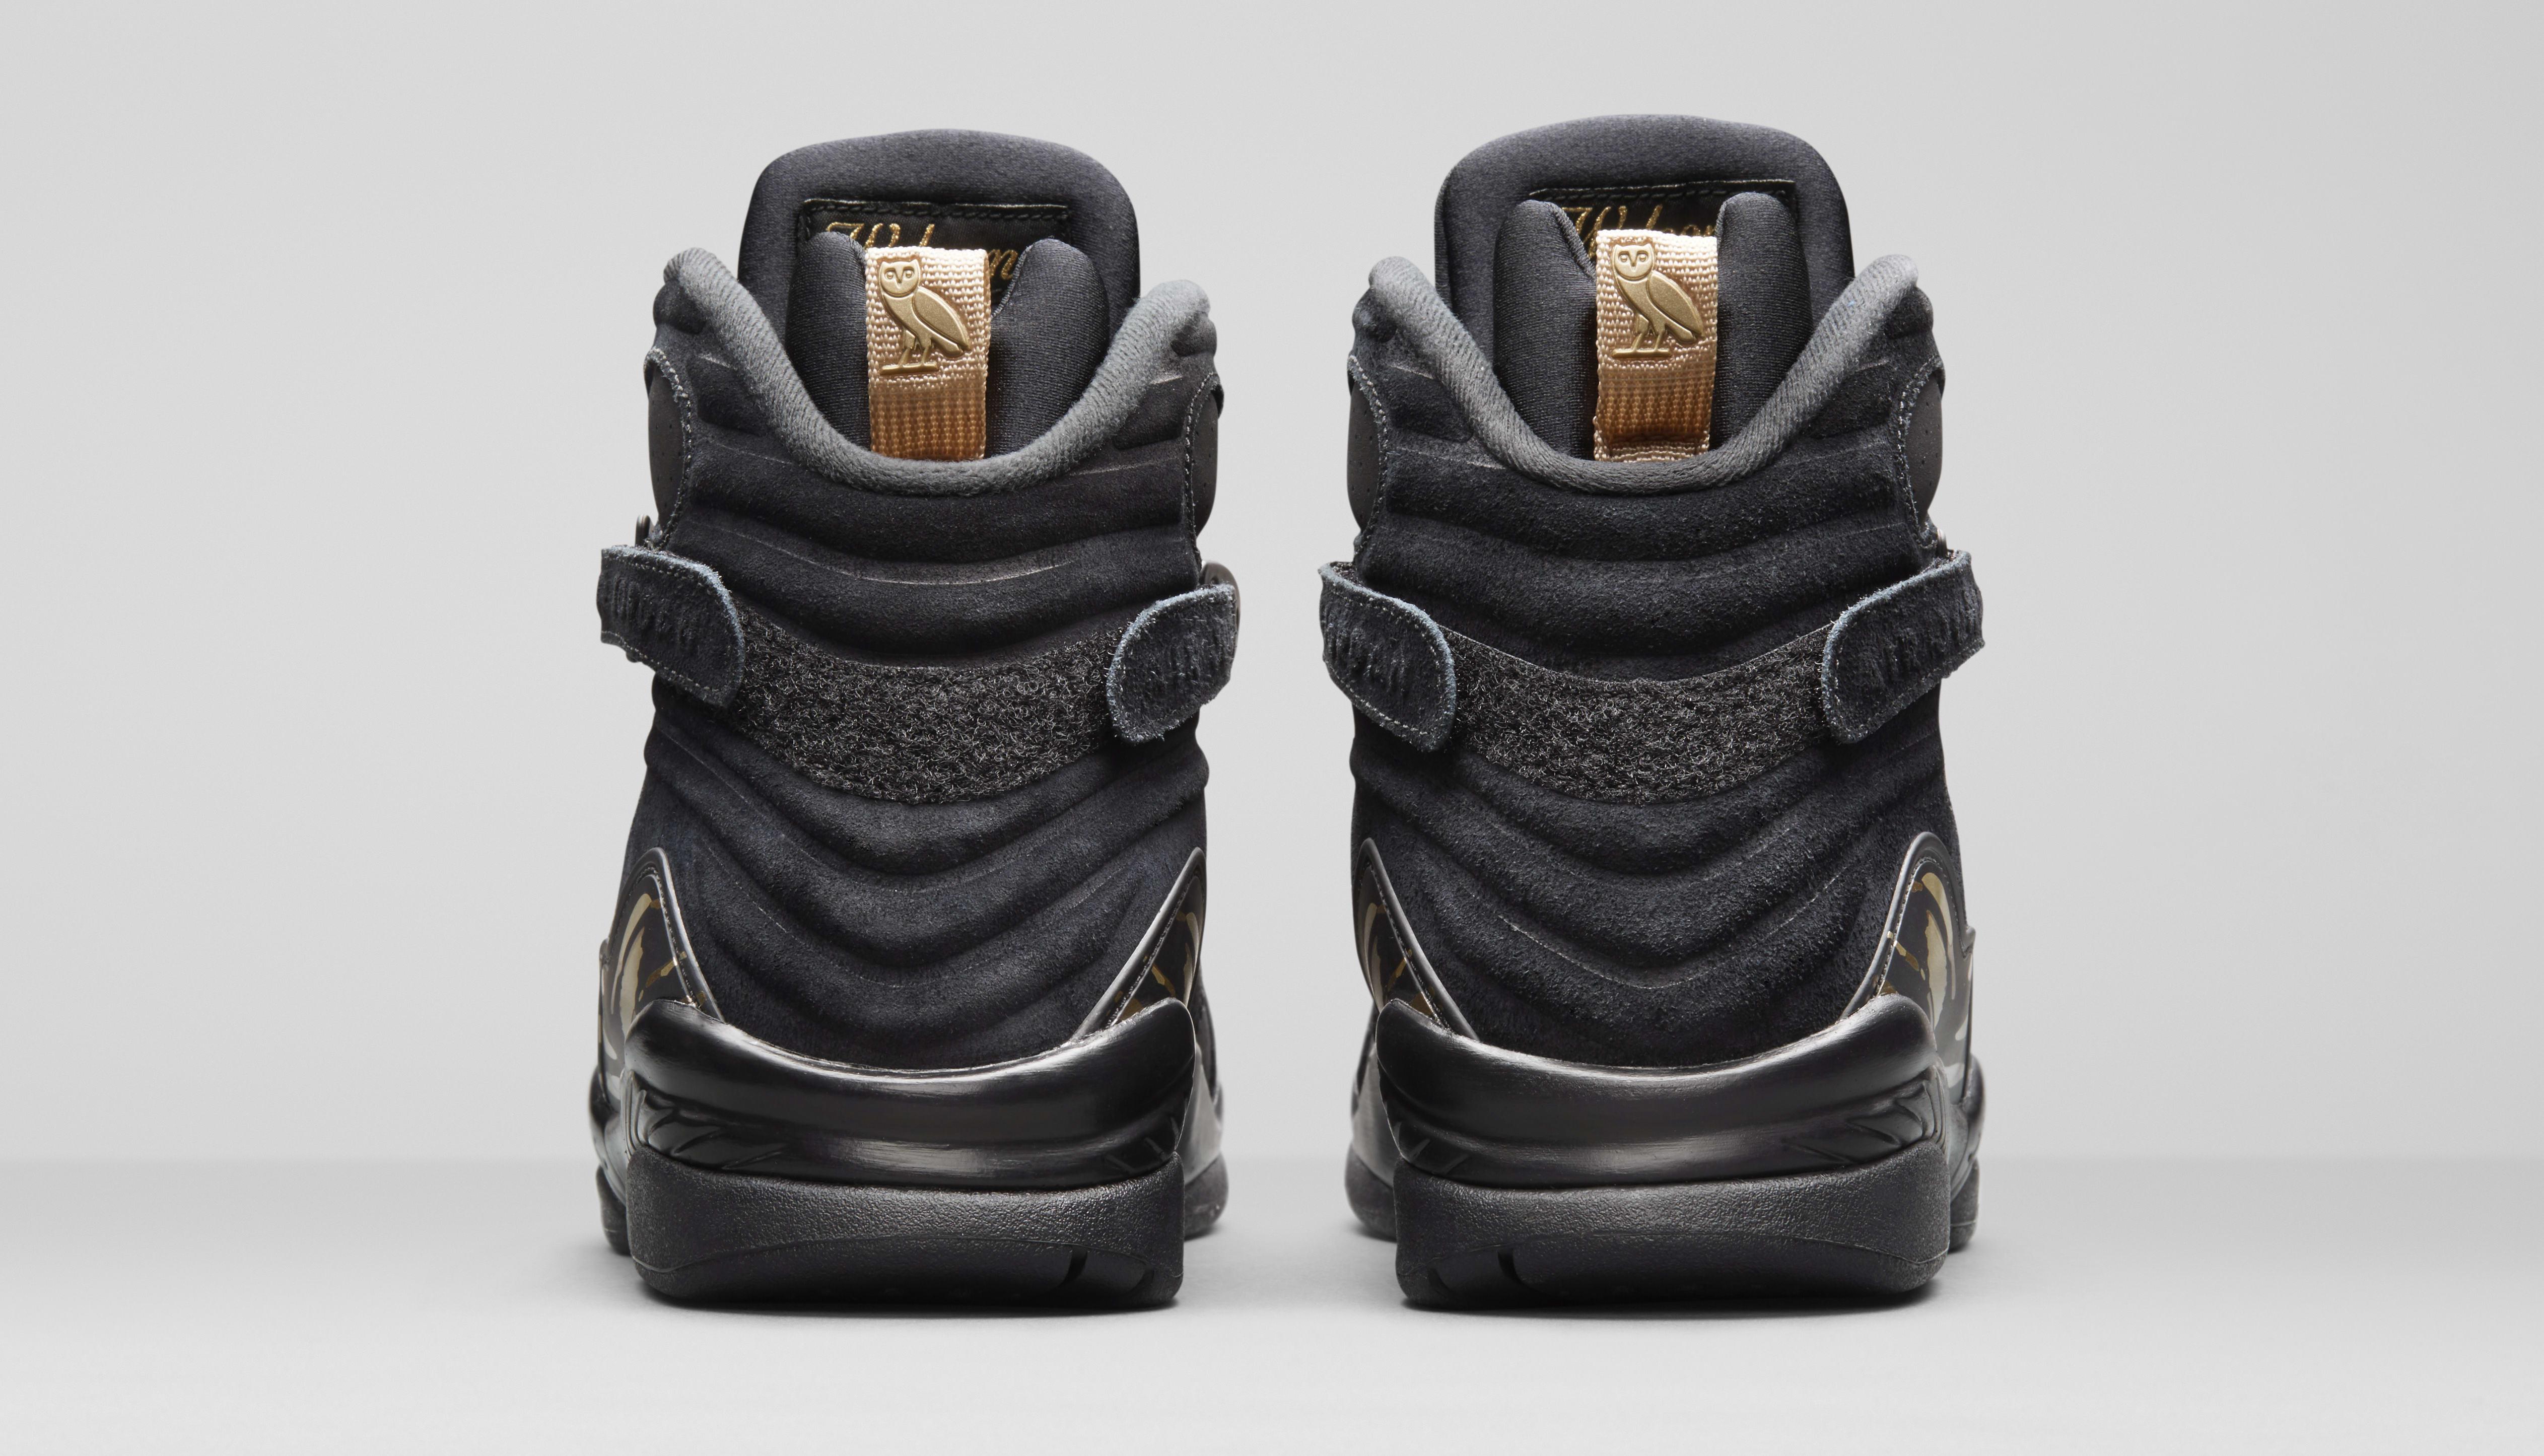 Air Jordan 8 'OVO' Black/Metallic Gold-Varsity Red-Blur AA1239-045 (Heel)